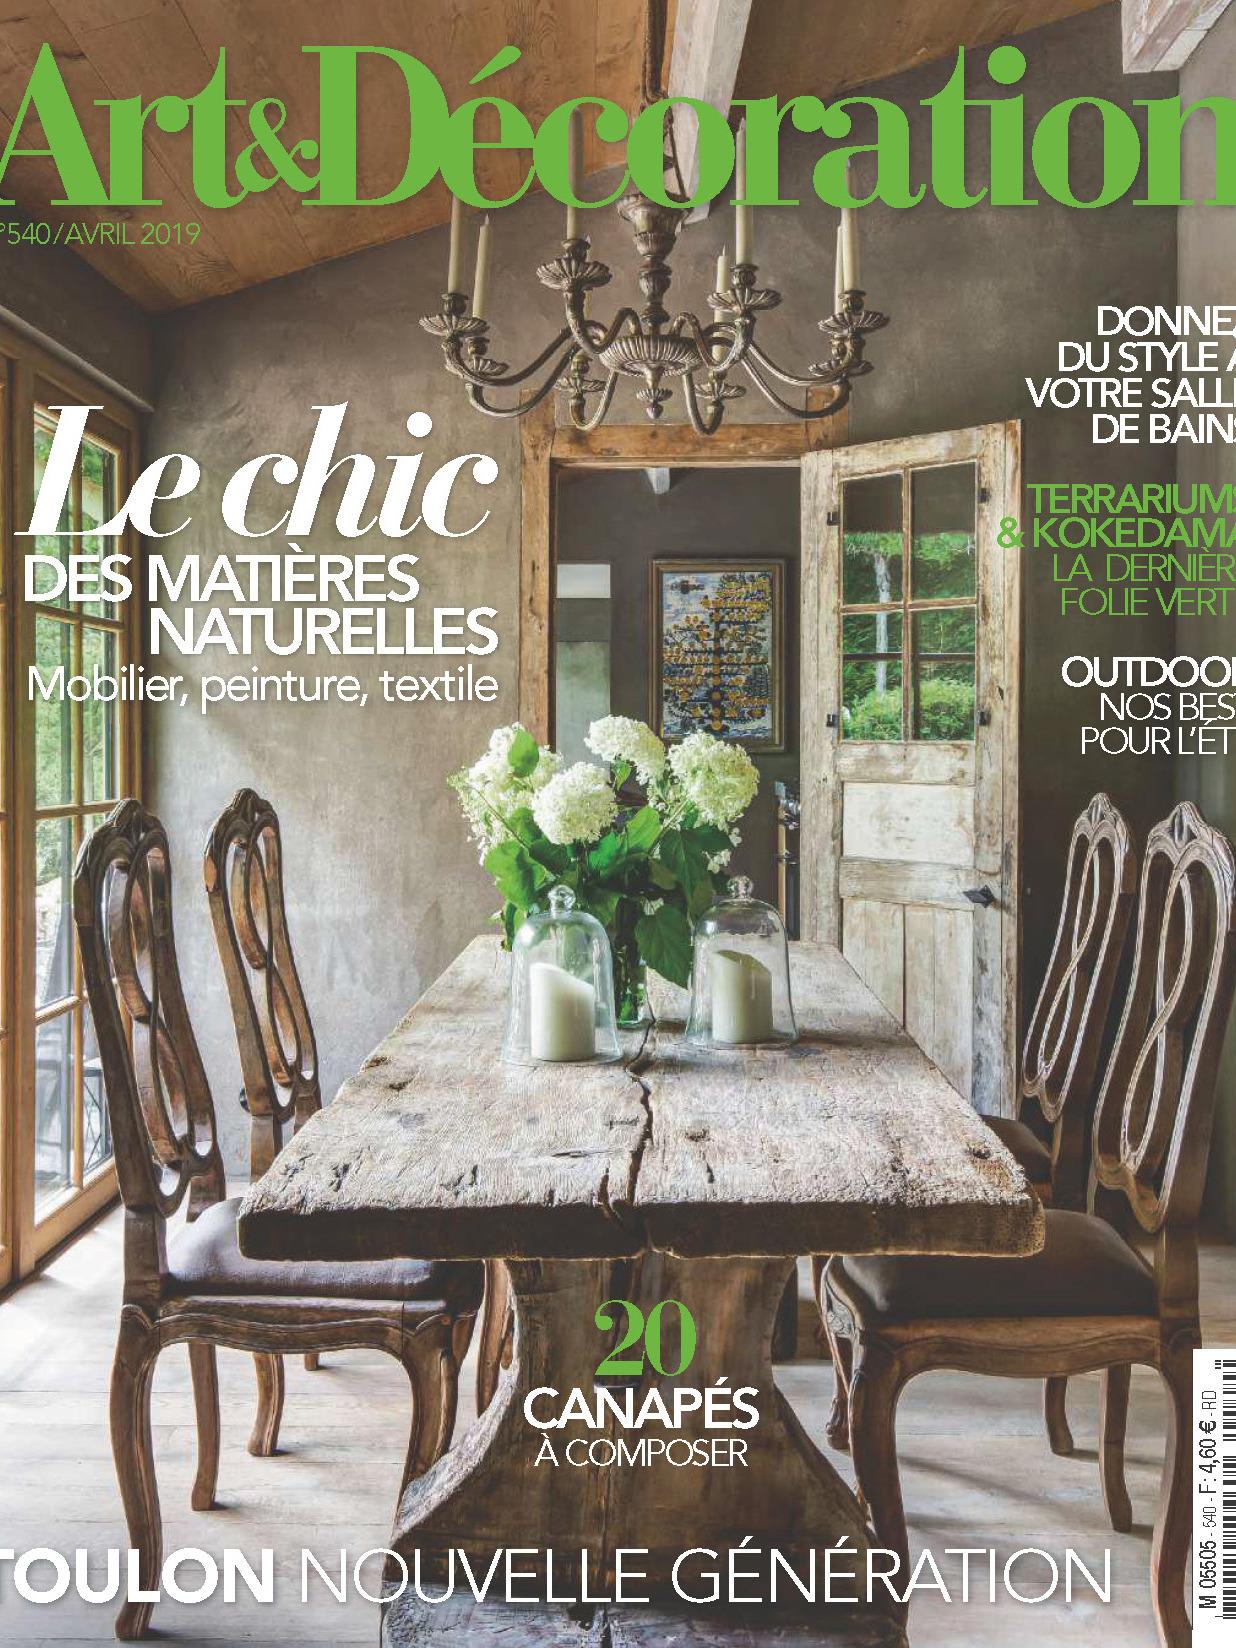 《Art&Decoration》法国版时尚综合杂志2019年04月号